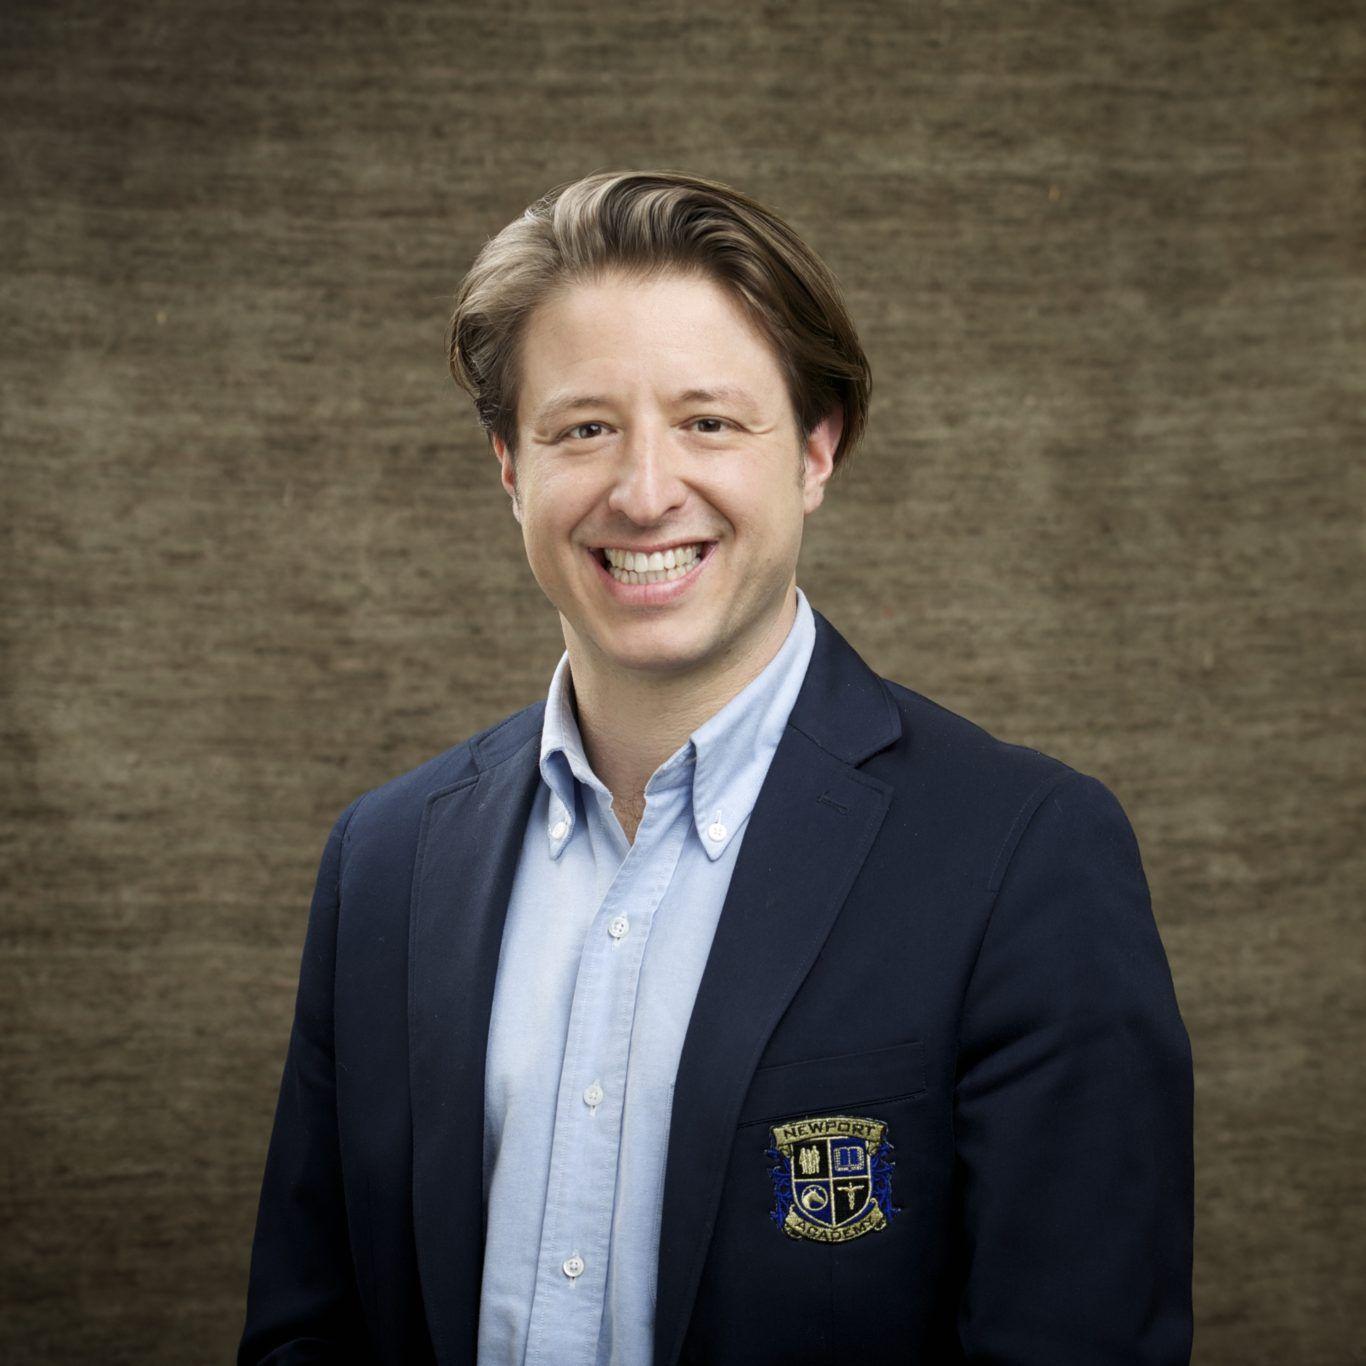 Jeffrey Zurofsky